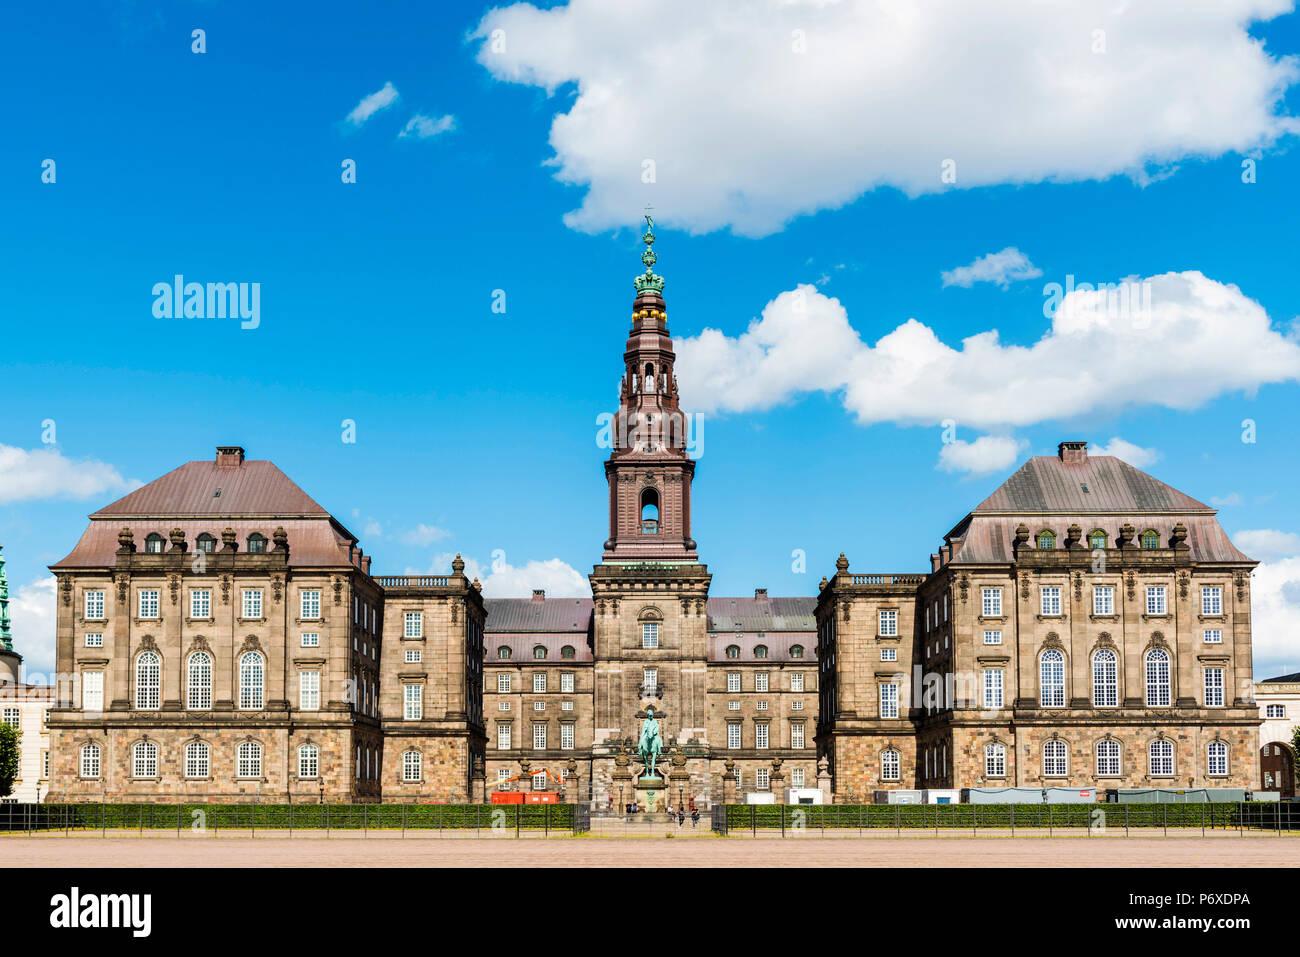 Christiansborg Palace, Copenhagen, Hovedstaden, Denmark. - Stock Image